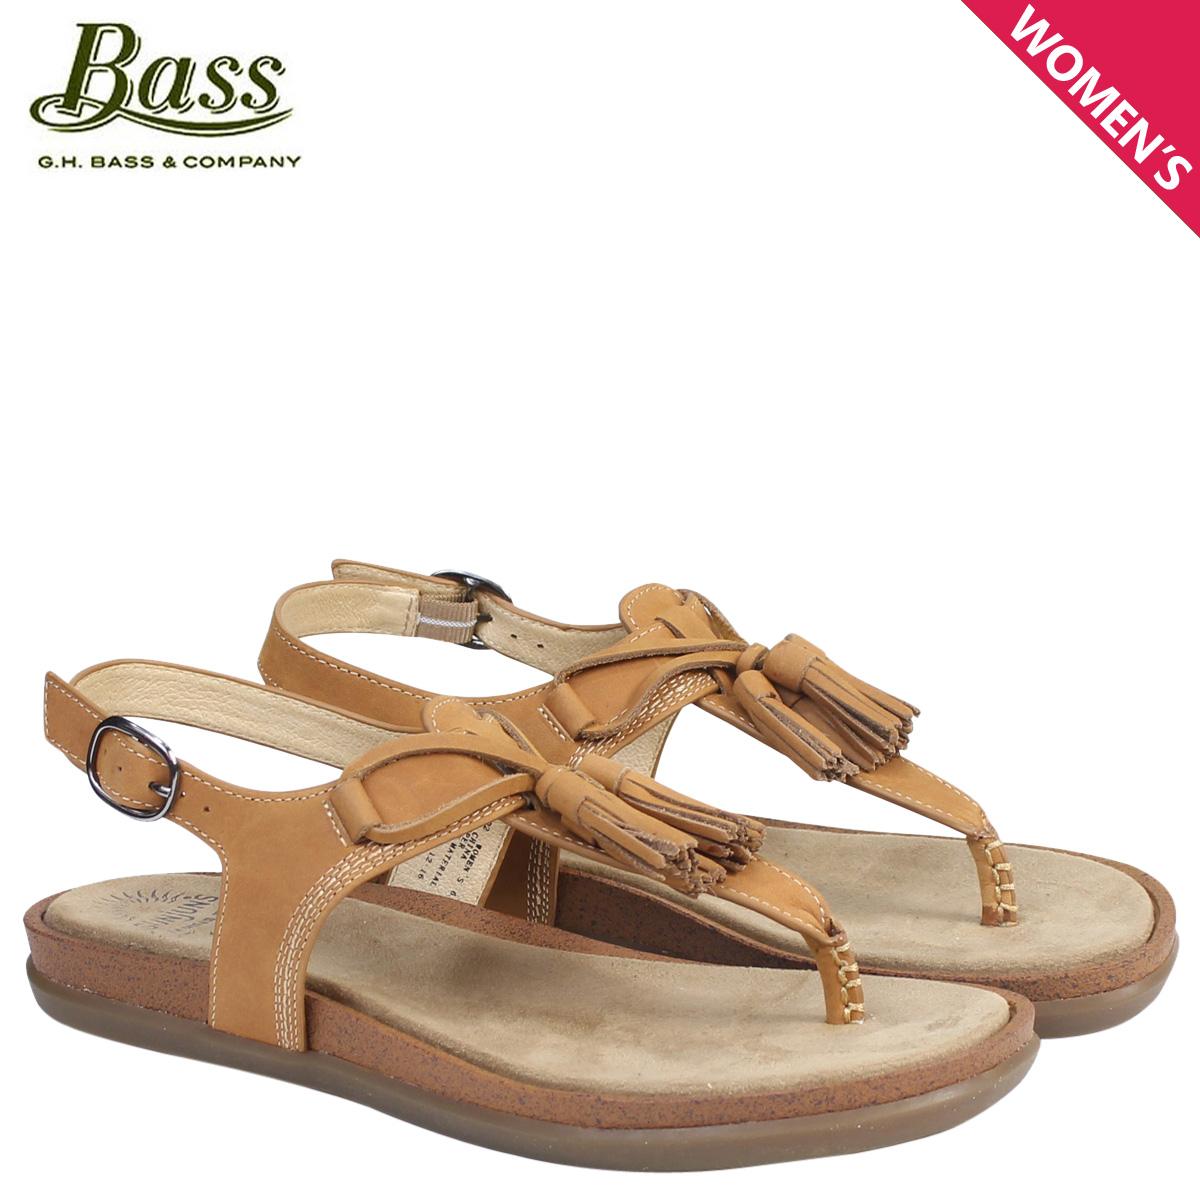 G H bus sandals Lady's G.H. BASS